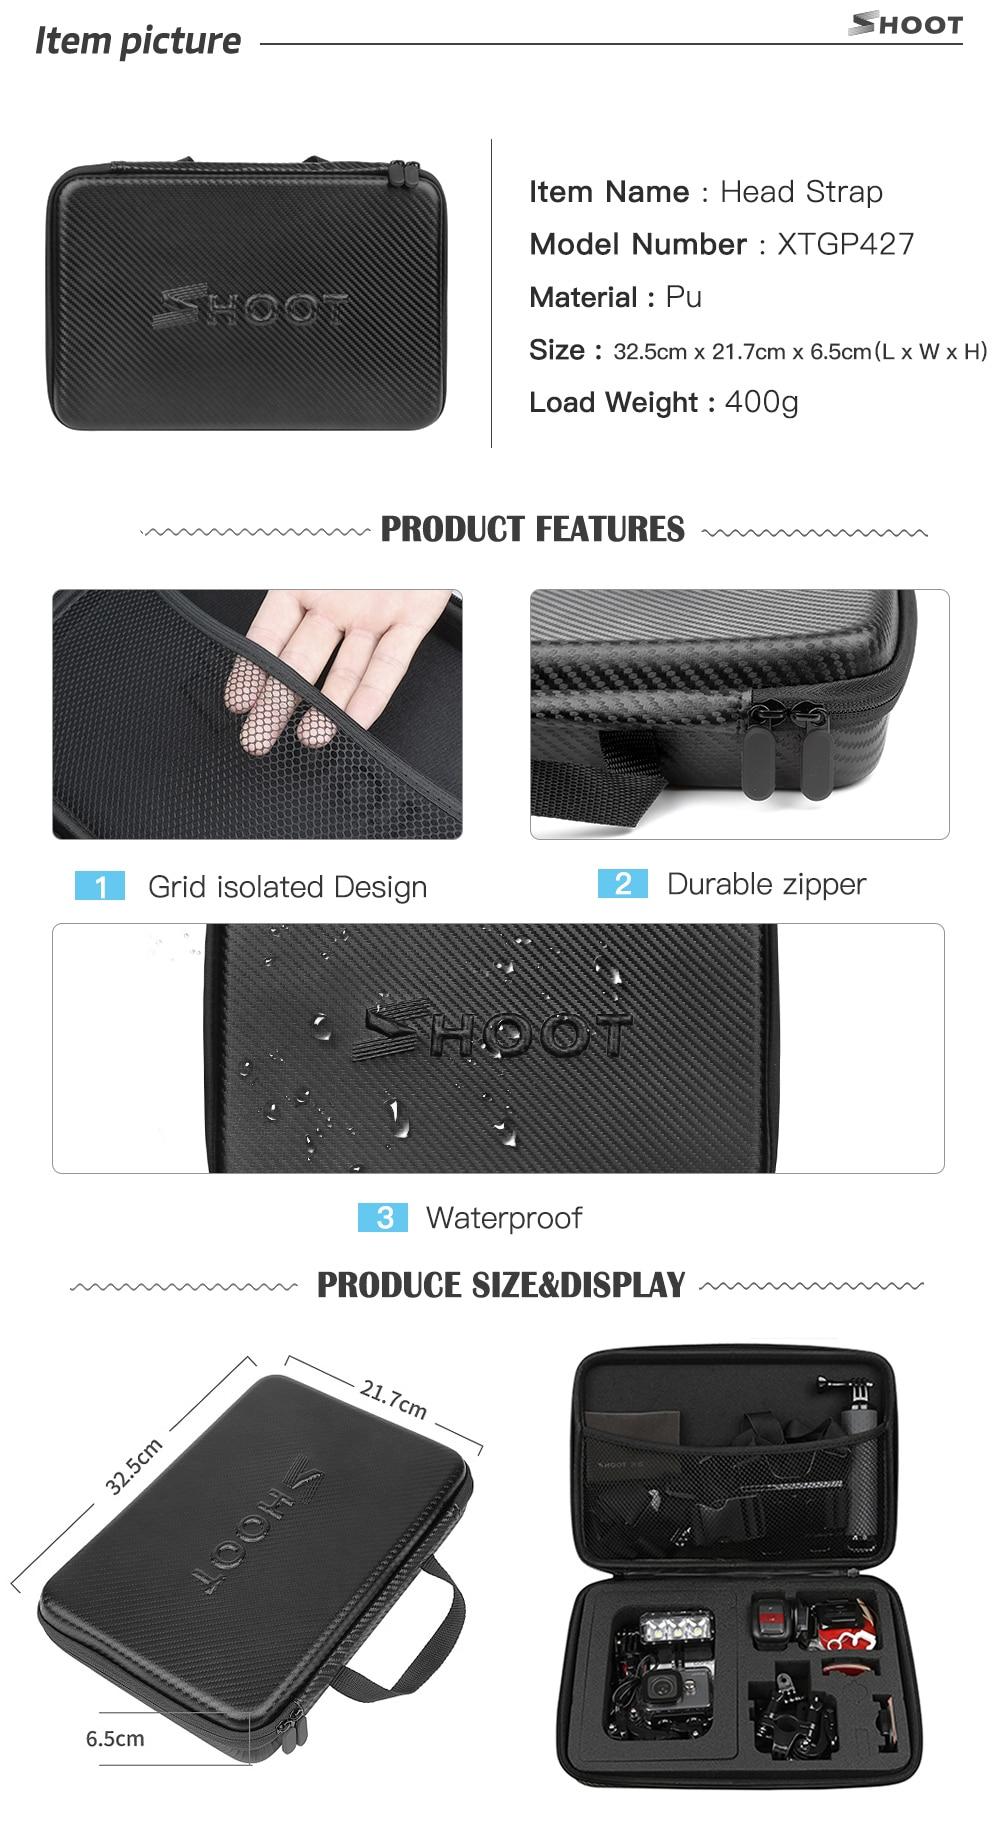 SHOOT Action Camera Accessory for GoPro Hero 7 6 5 4 Black Xiaomi Yi 4K Lite 2 SJCAM SJ7 Eken H9 Go Pro Mount for Sony Nikon Set